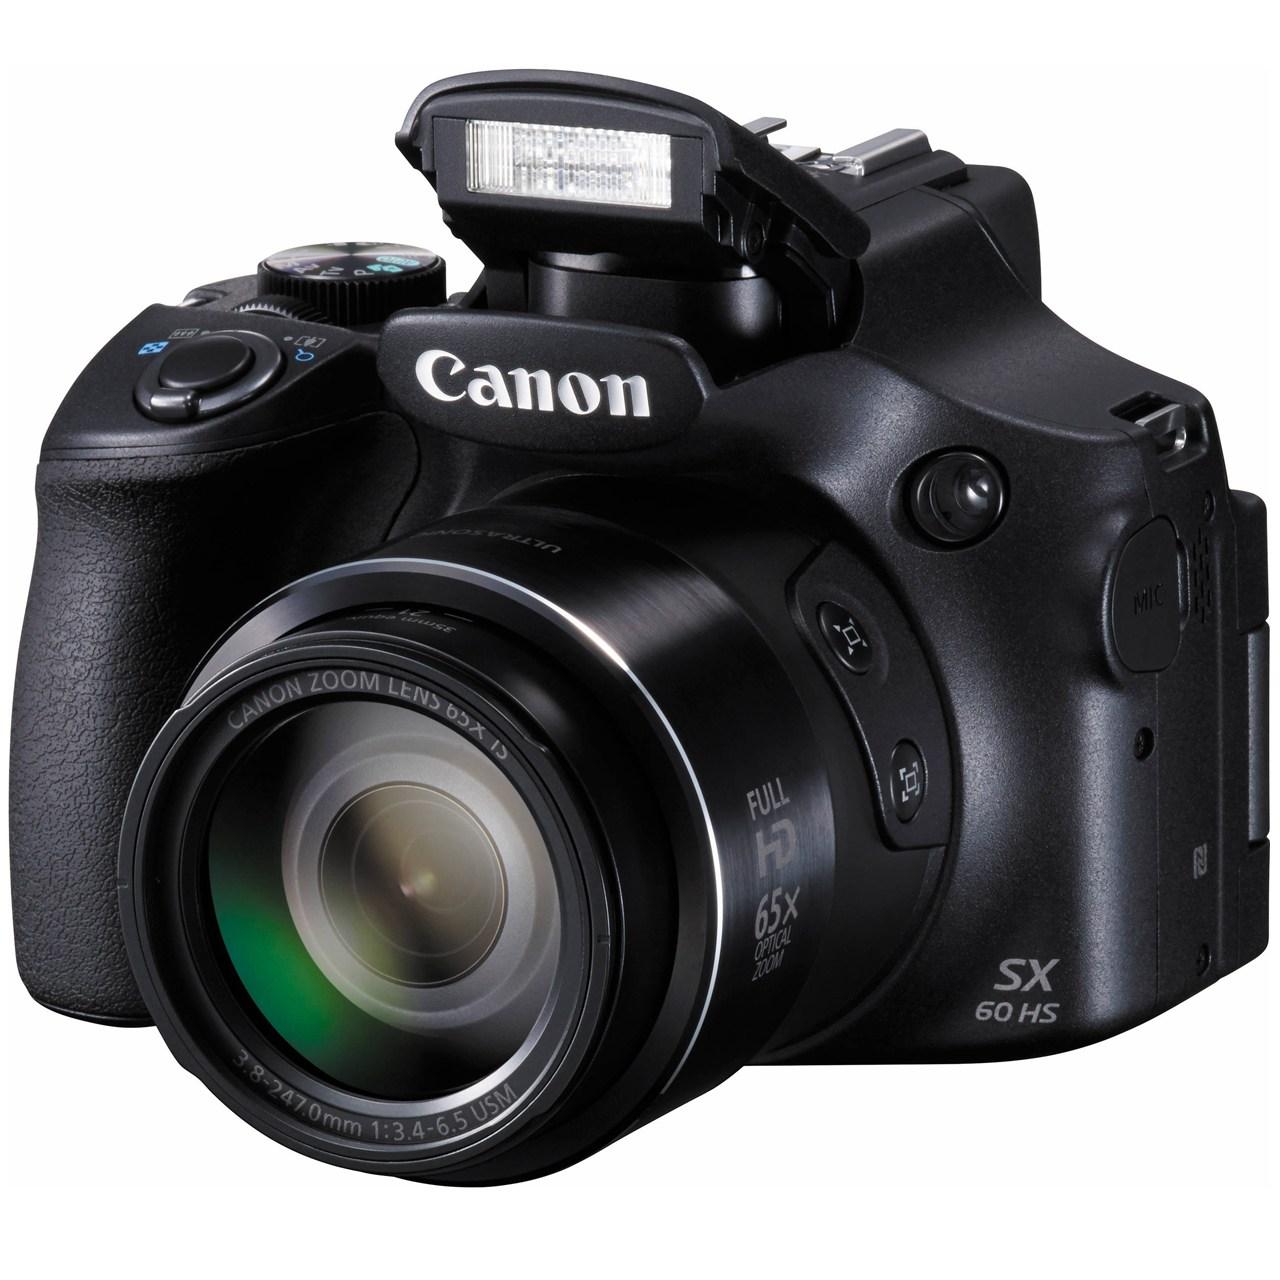 دوربین دیجیتال کانن مدل Powershot SX60 HS